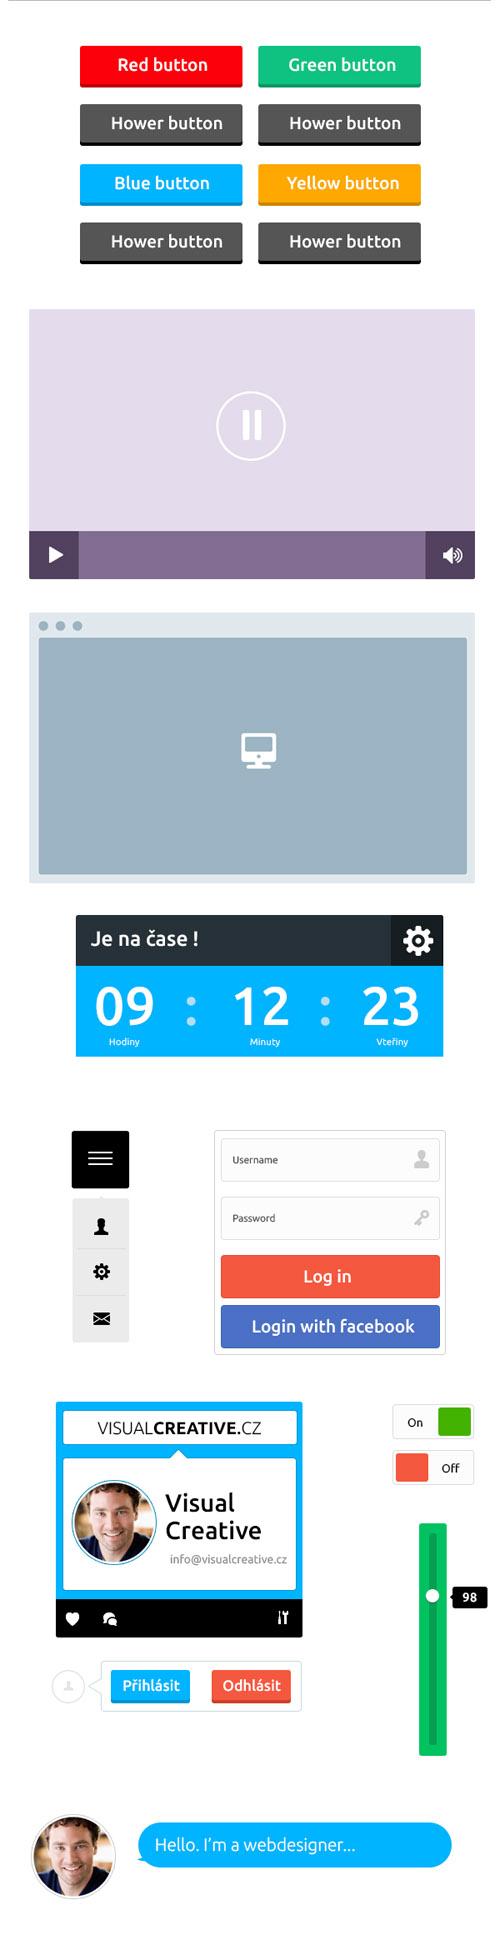 Flat Elements for Web UI Design-25